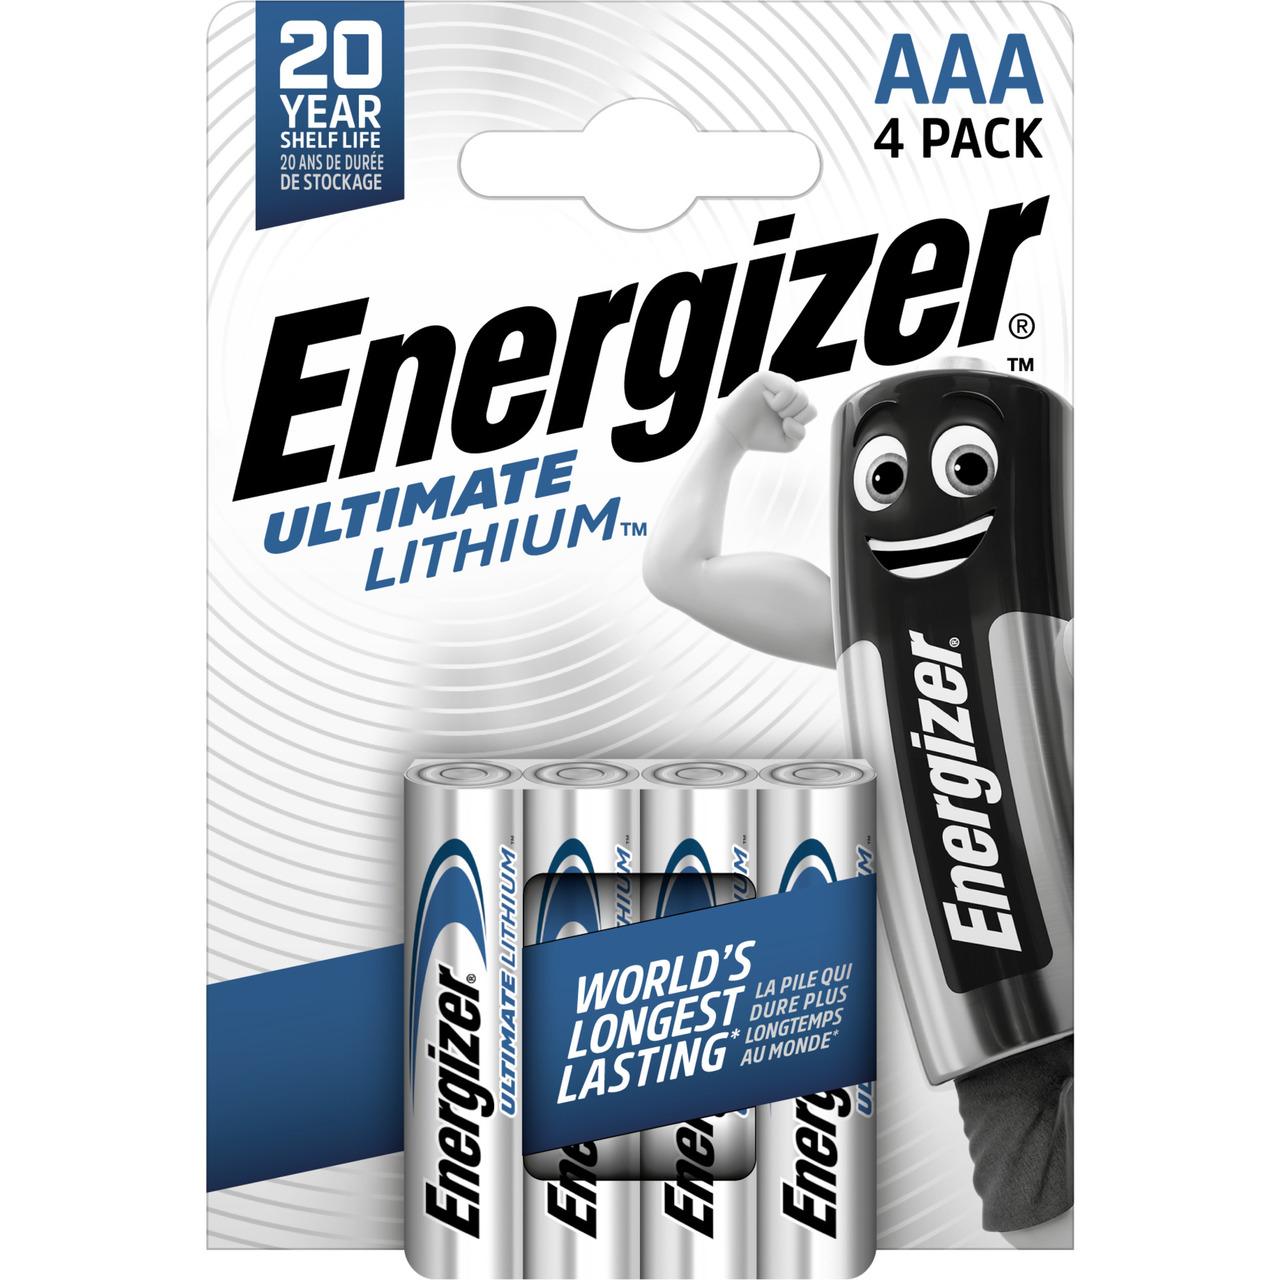 Energizer Ultimate Lithium-Batterie Micro AAA- 1-5V- 1250 mAh- 4er Pack